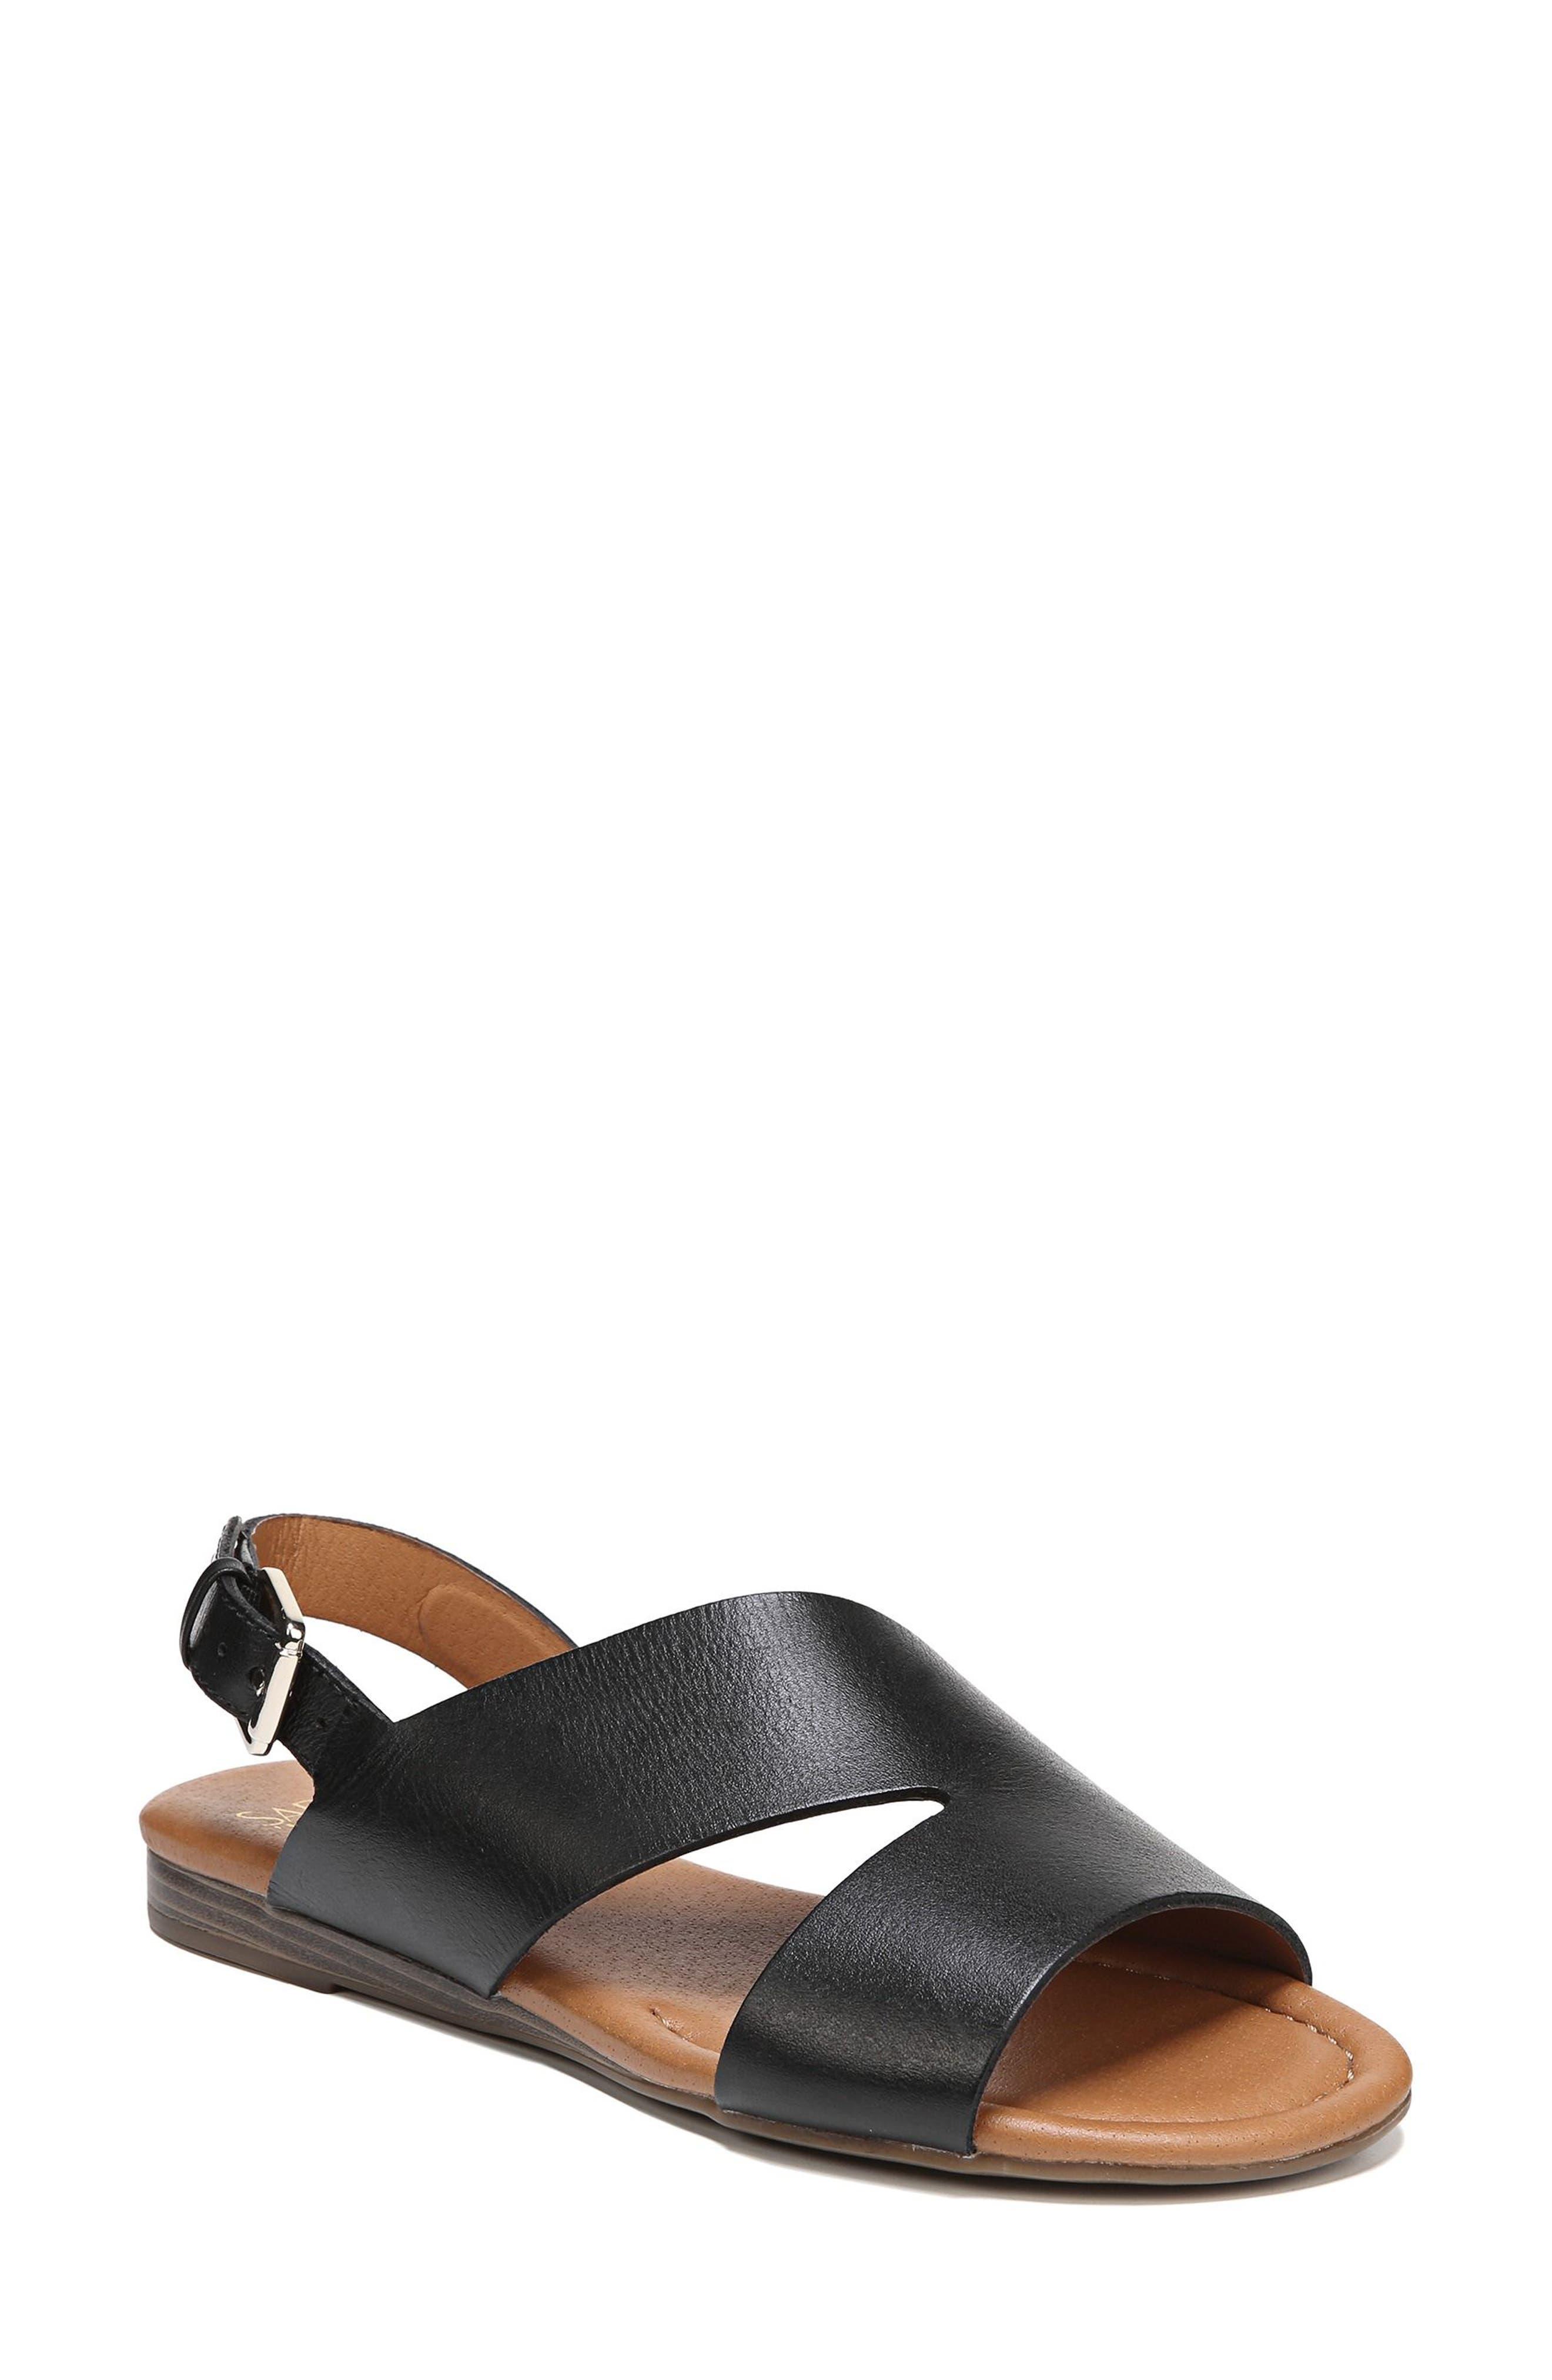 Garza Slingback Sandal,                         Main,                         color, 001